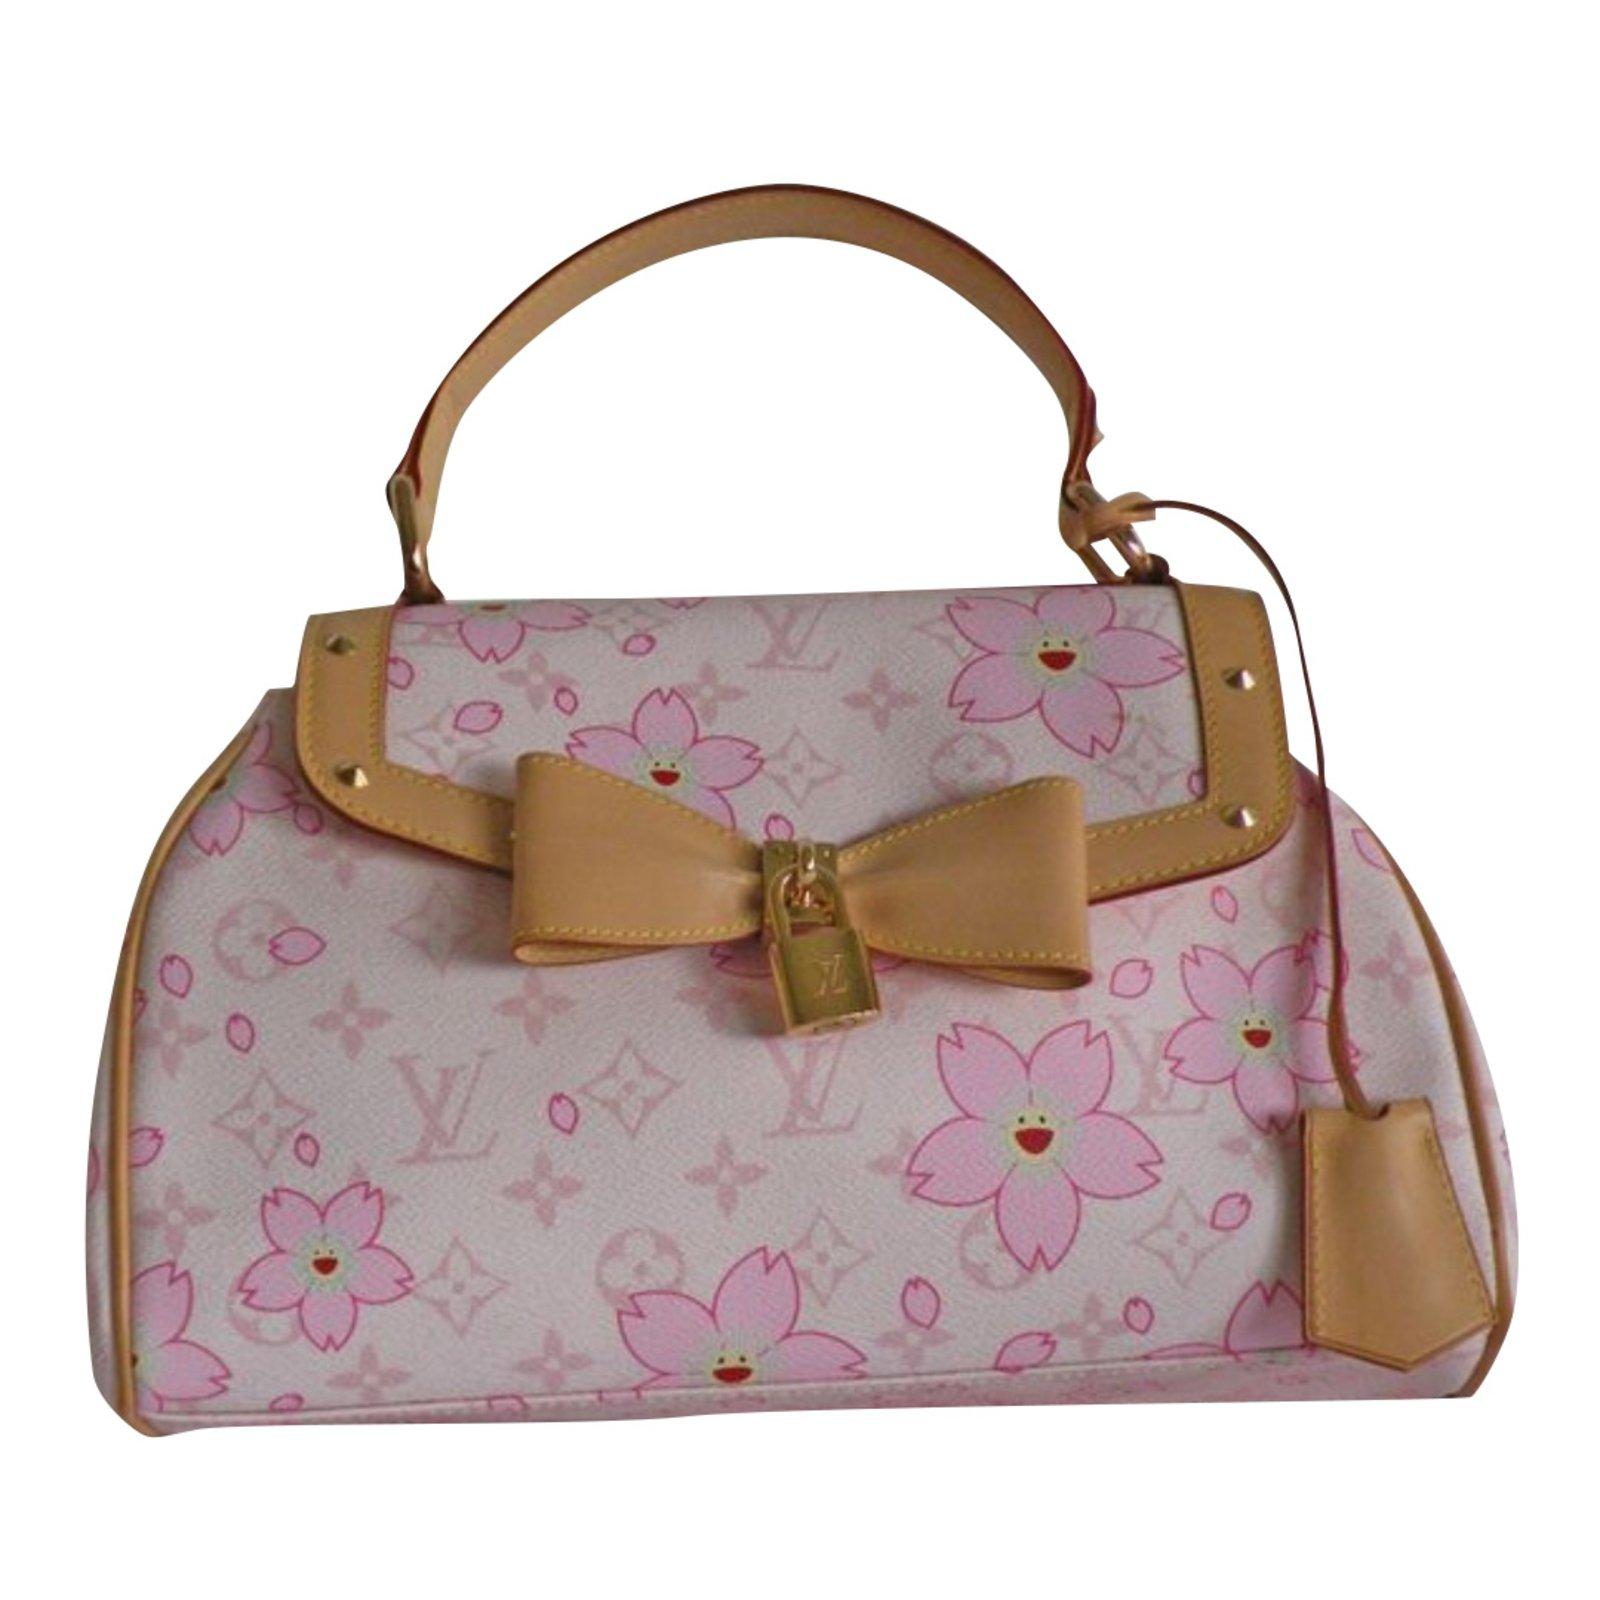 Louis vuitton retro cherry blossom takashi murakami handbags leather cloth  pink ref jpg 1600x1600 Cherry blossom 2f1348b8c9368